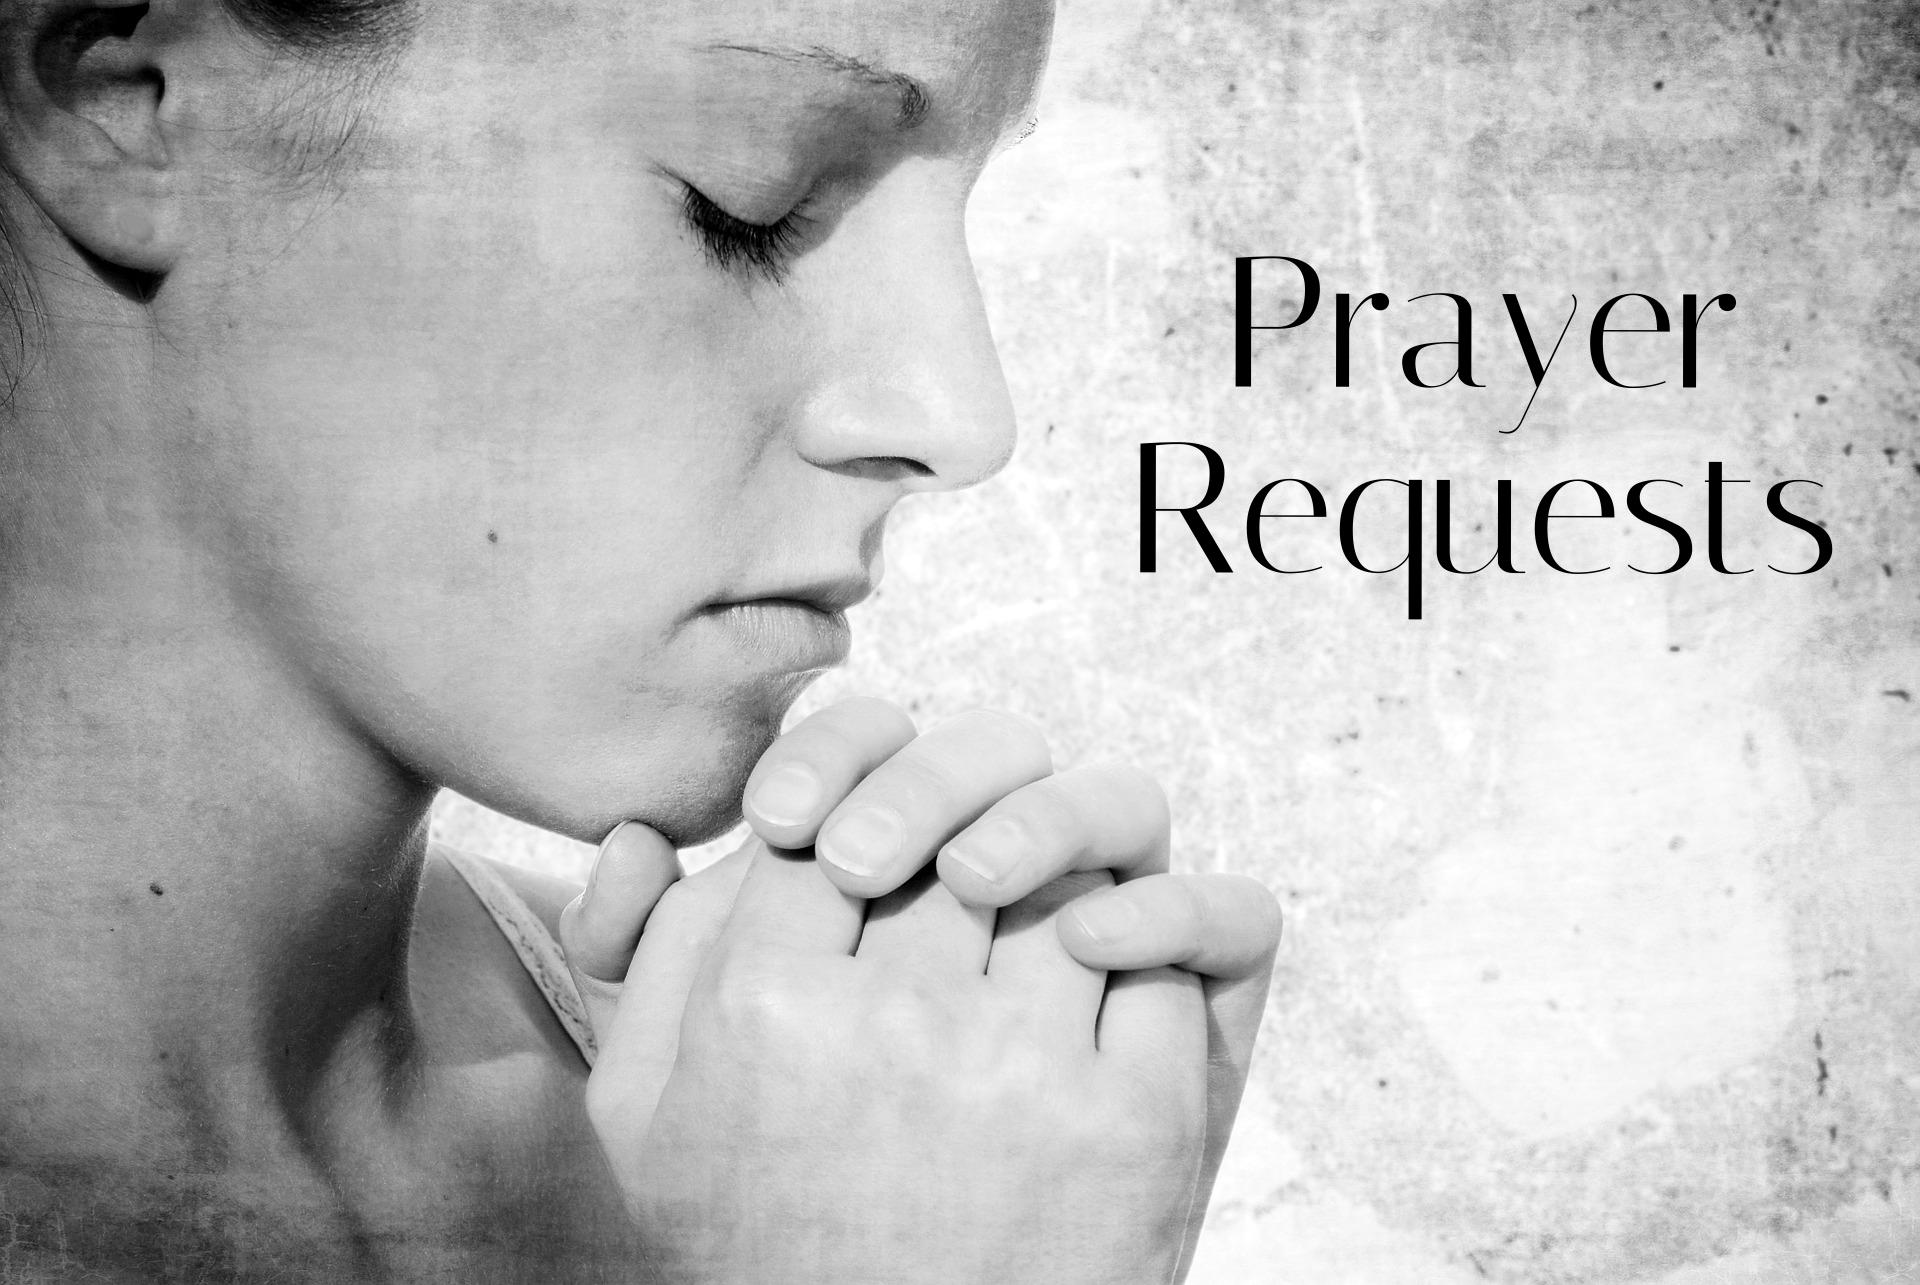 prayer-888757_1920.jpg